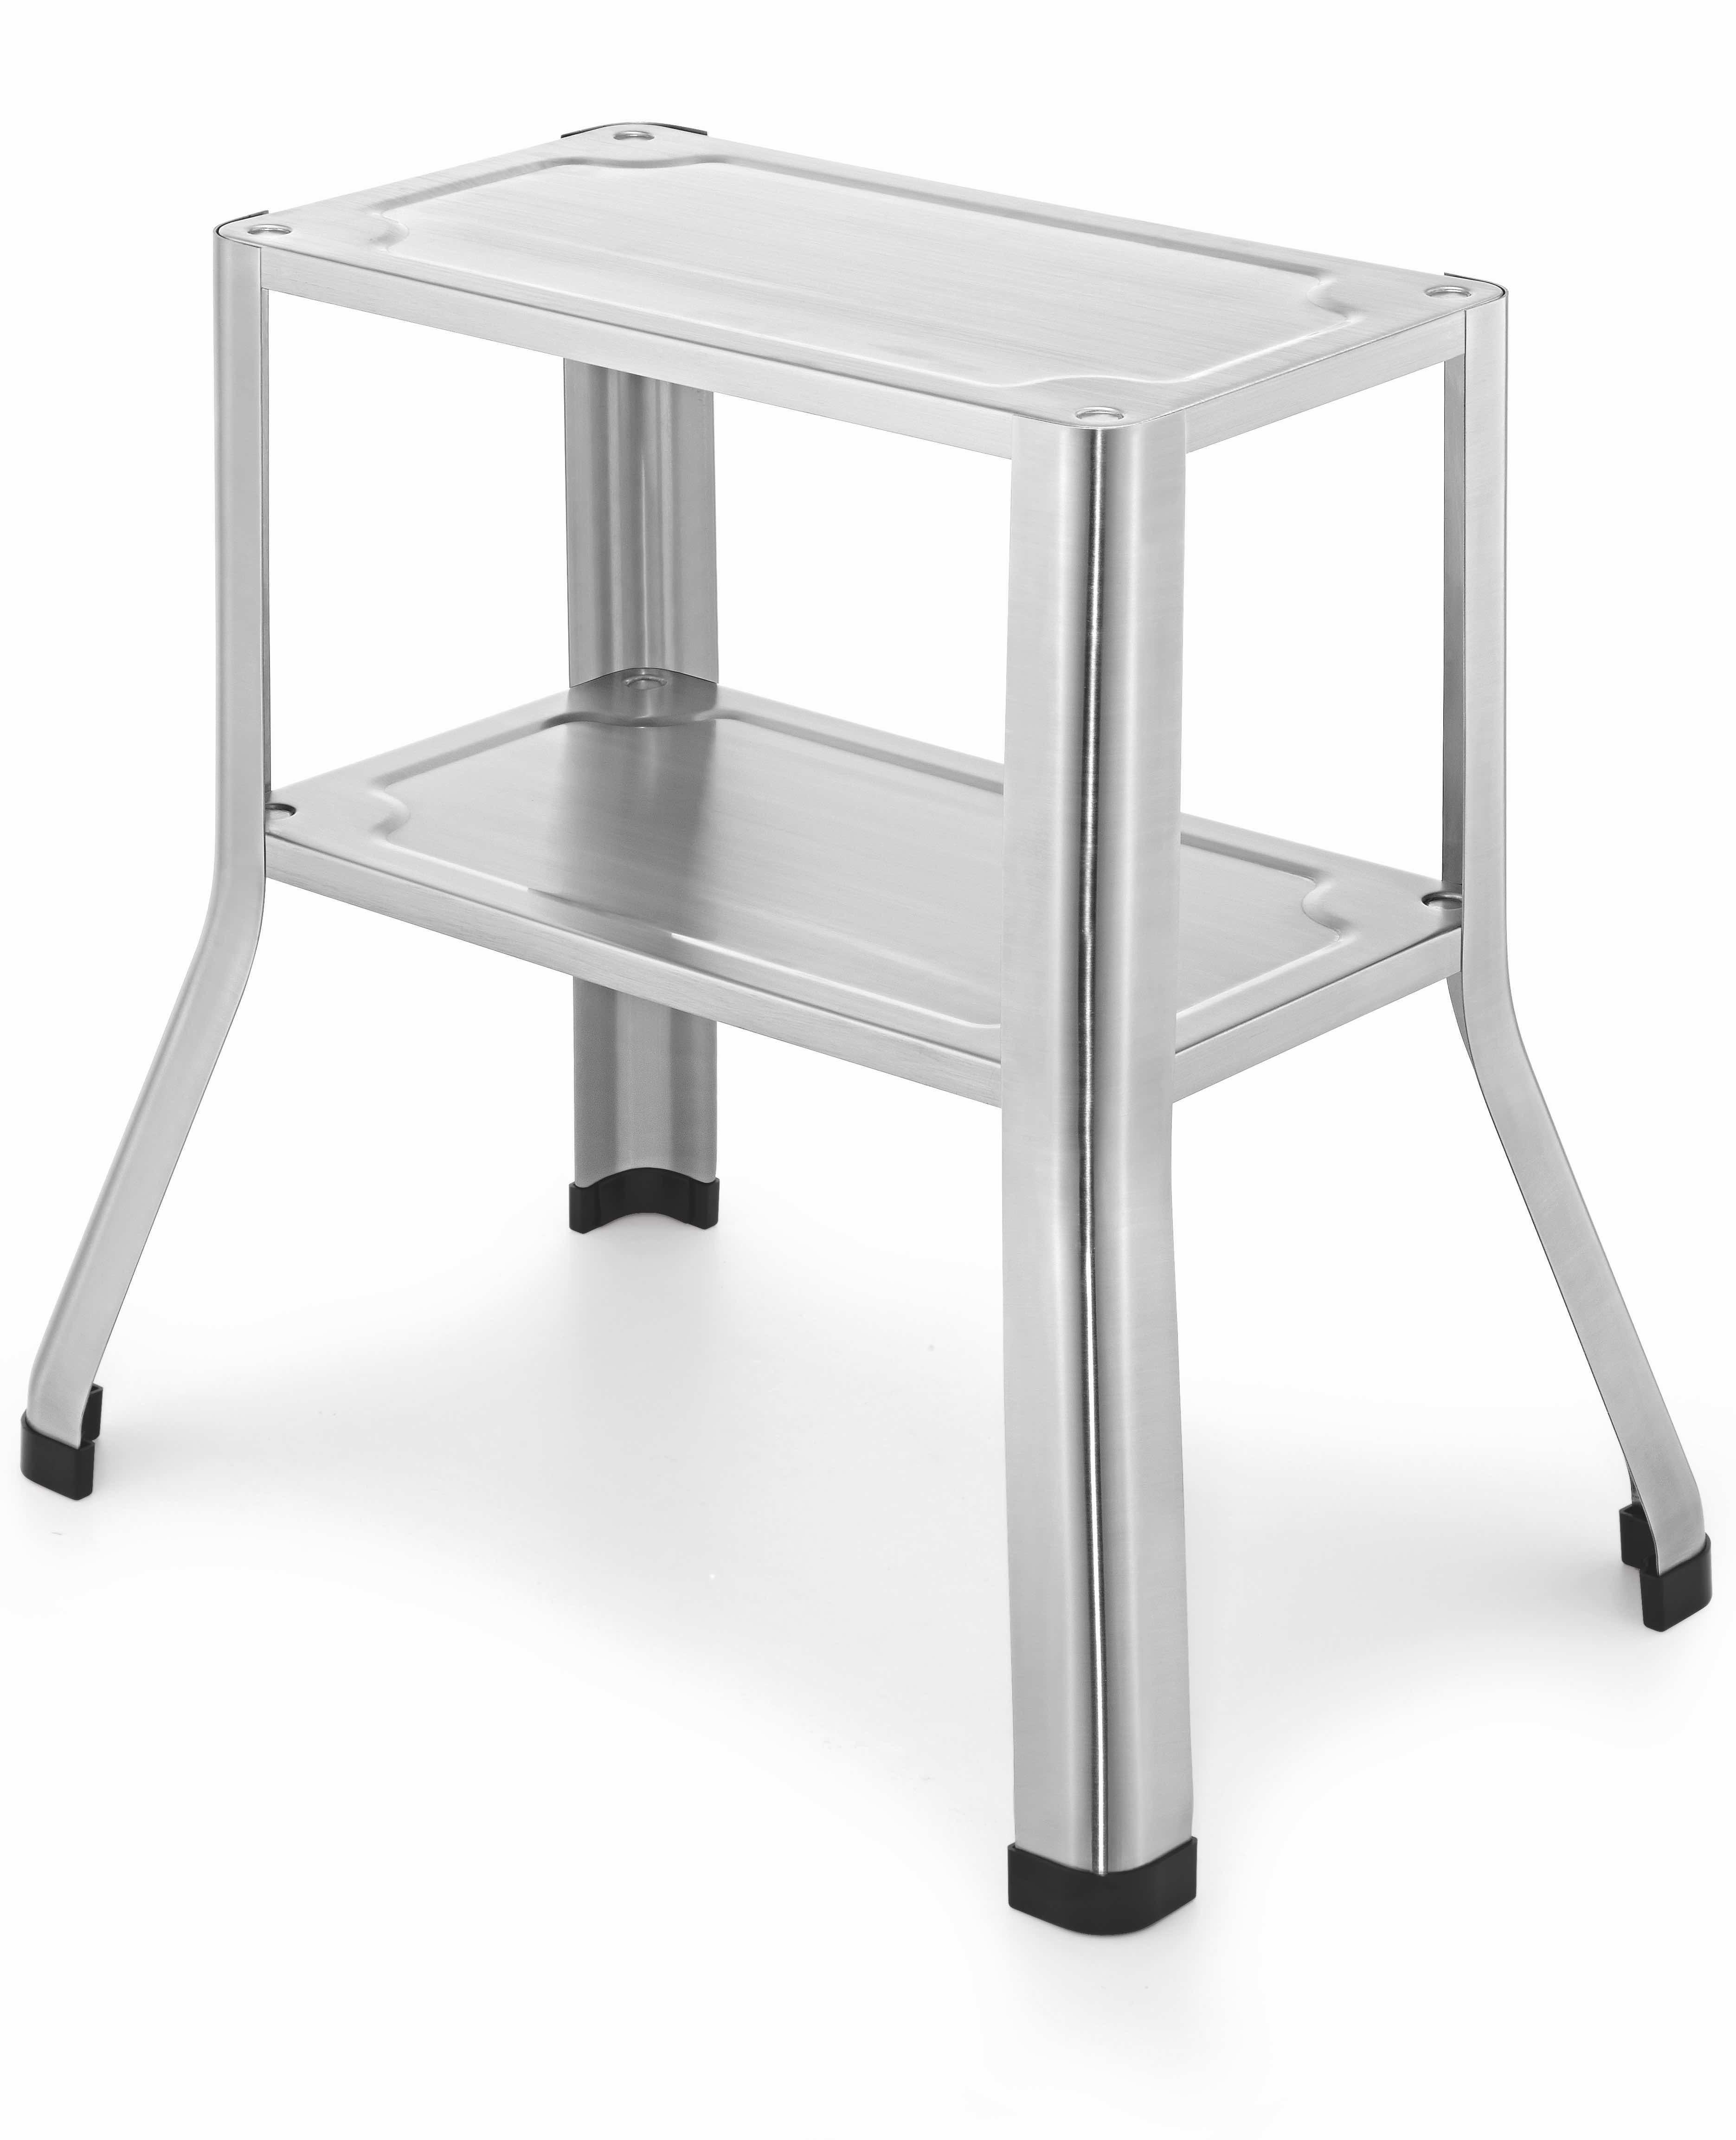 wmf lono base per grill raclette. Black Bedroom Furniture Sets. Home Design Ideas